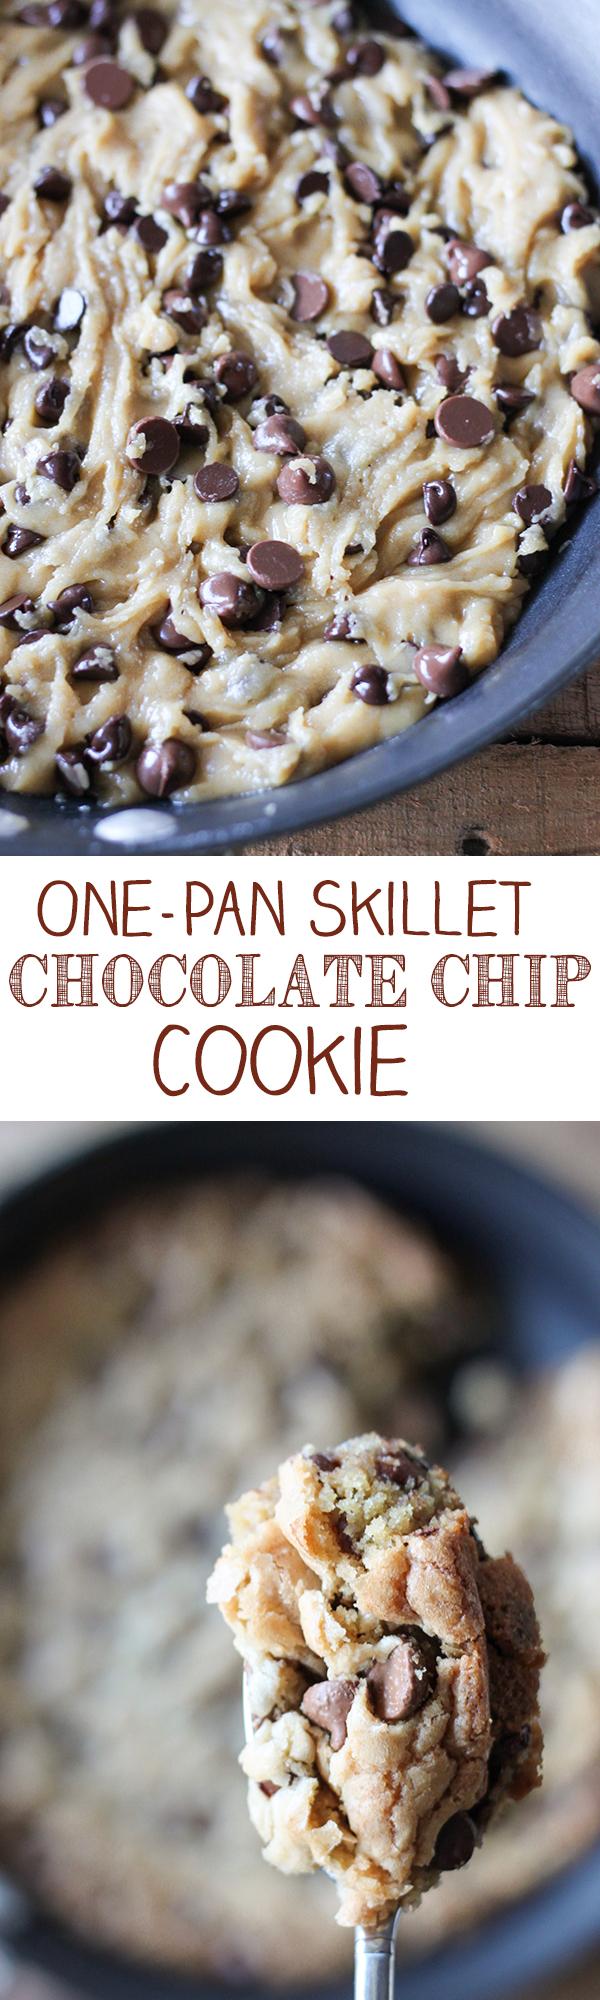 One-Pan Skillet Chocolate Chip Cookie